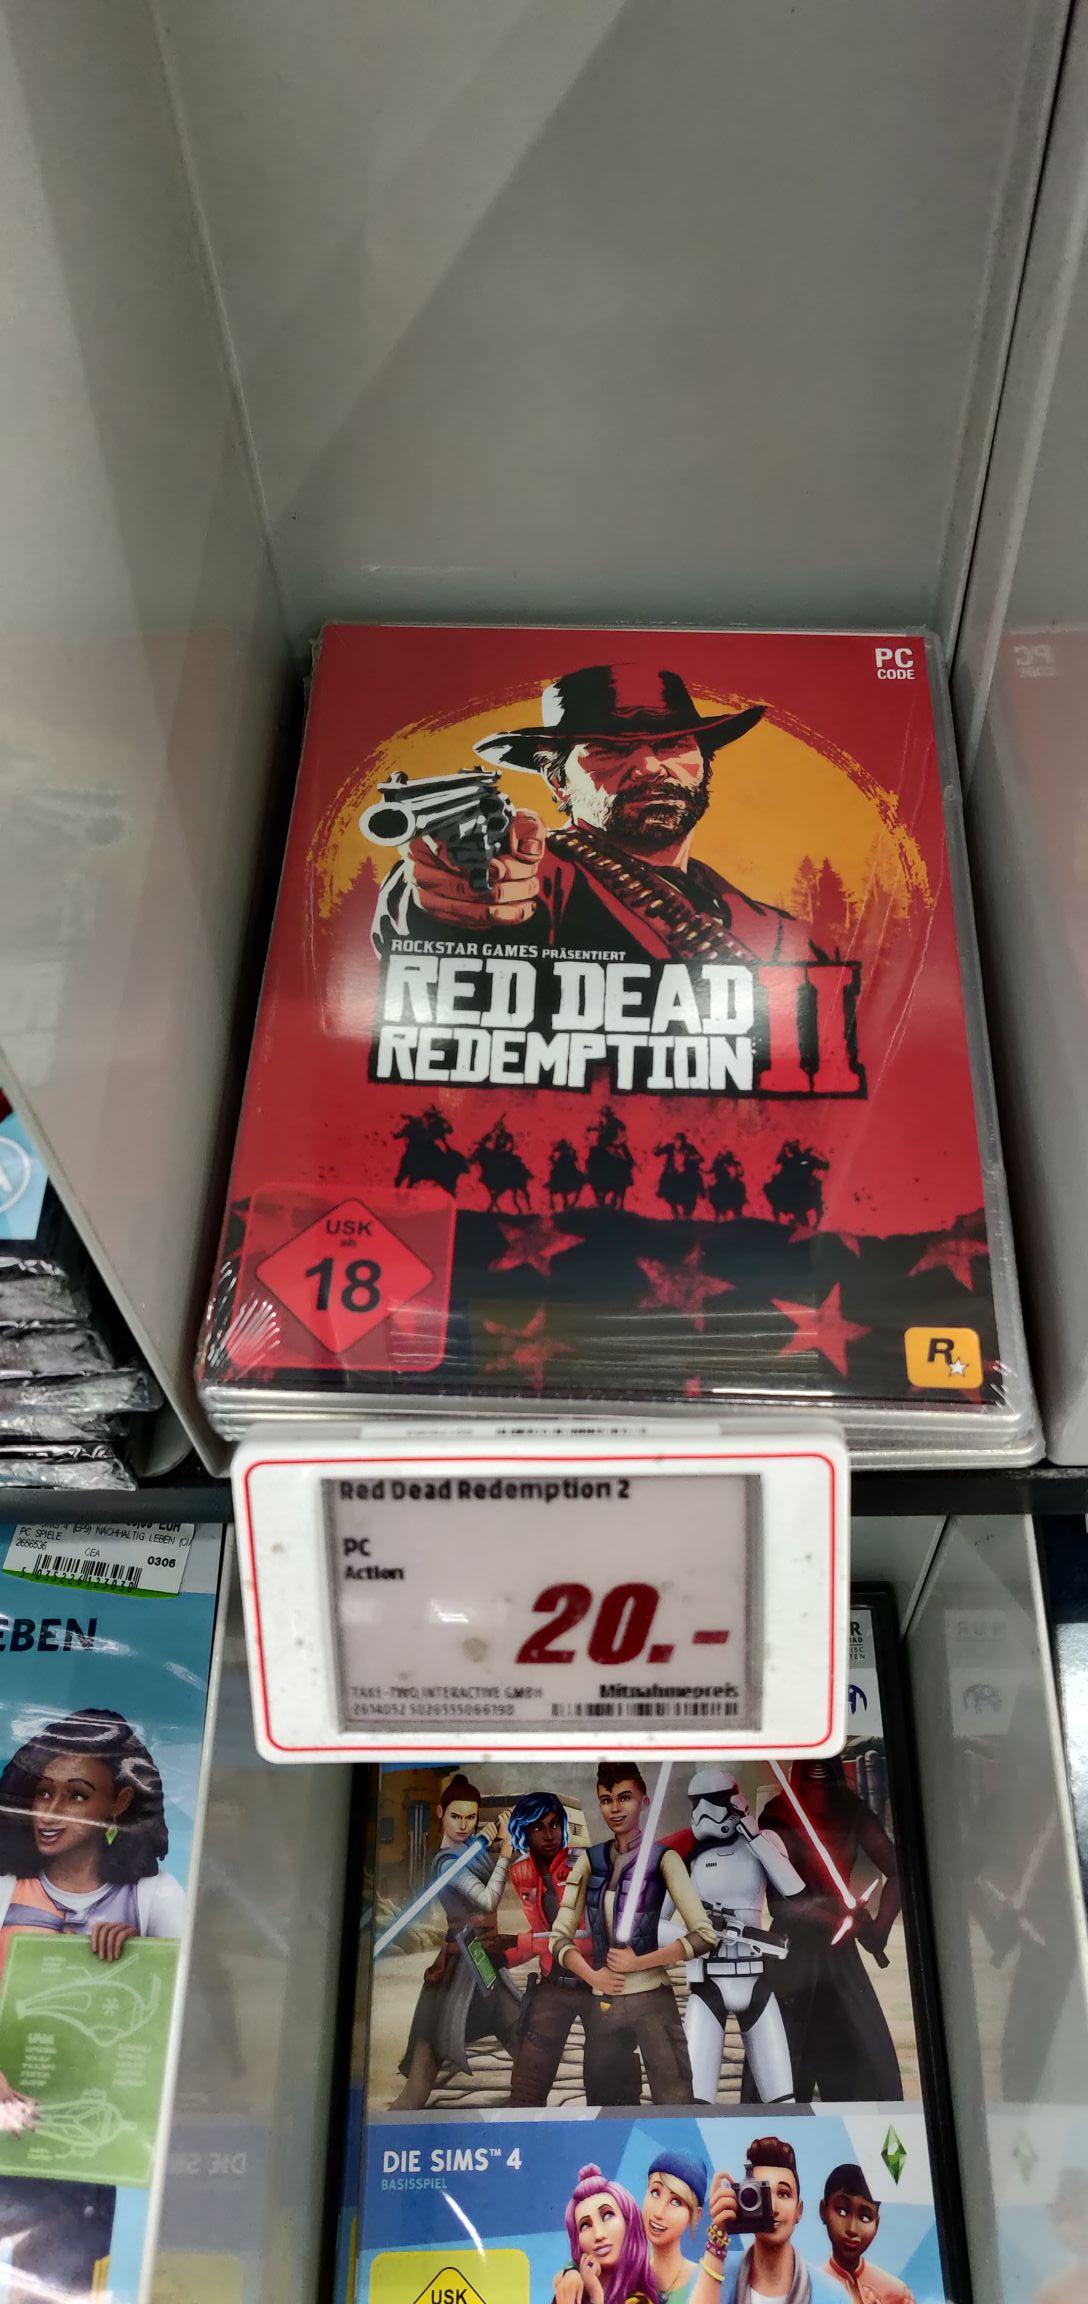 [Lokal] Mediamarkt Paderborn - Red Dead Redemption 2 PC